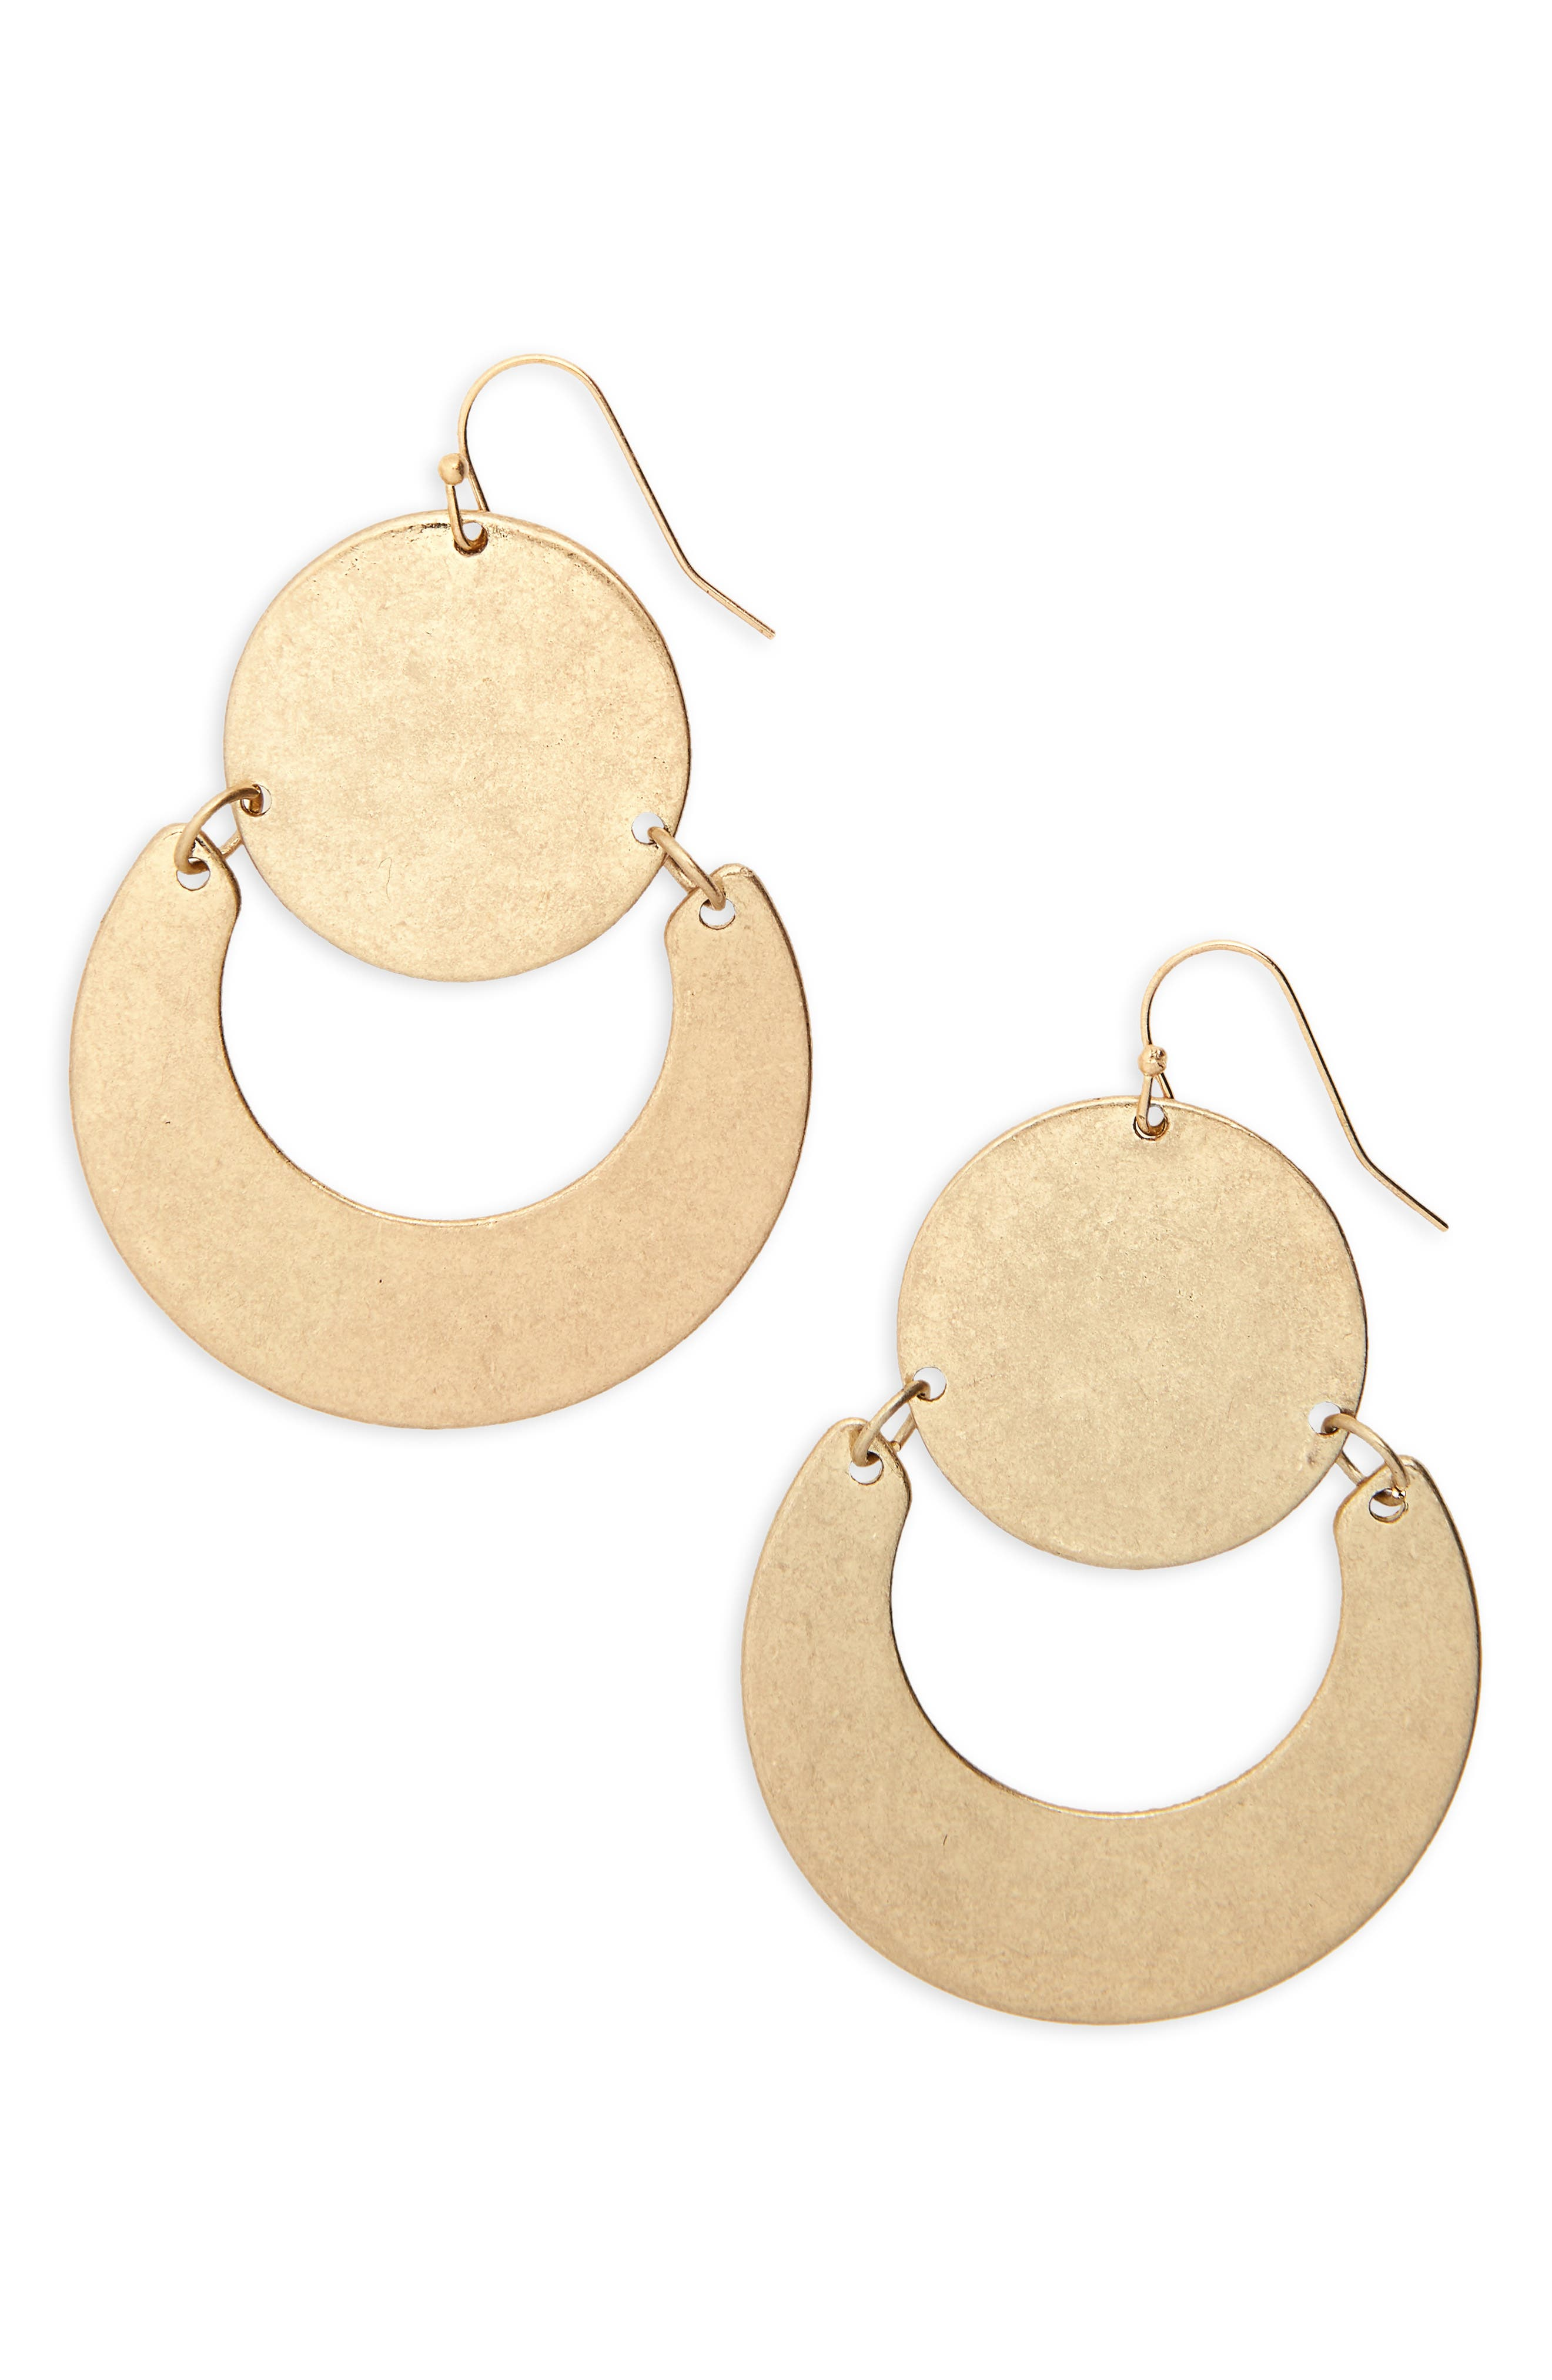 Circle U Earrings,                             Main thumbnail 1, color,                             710